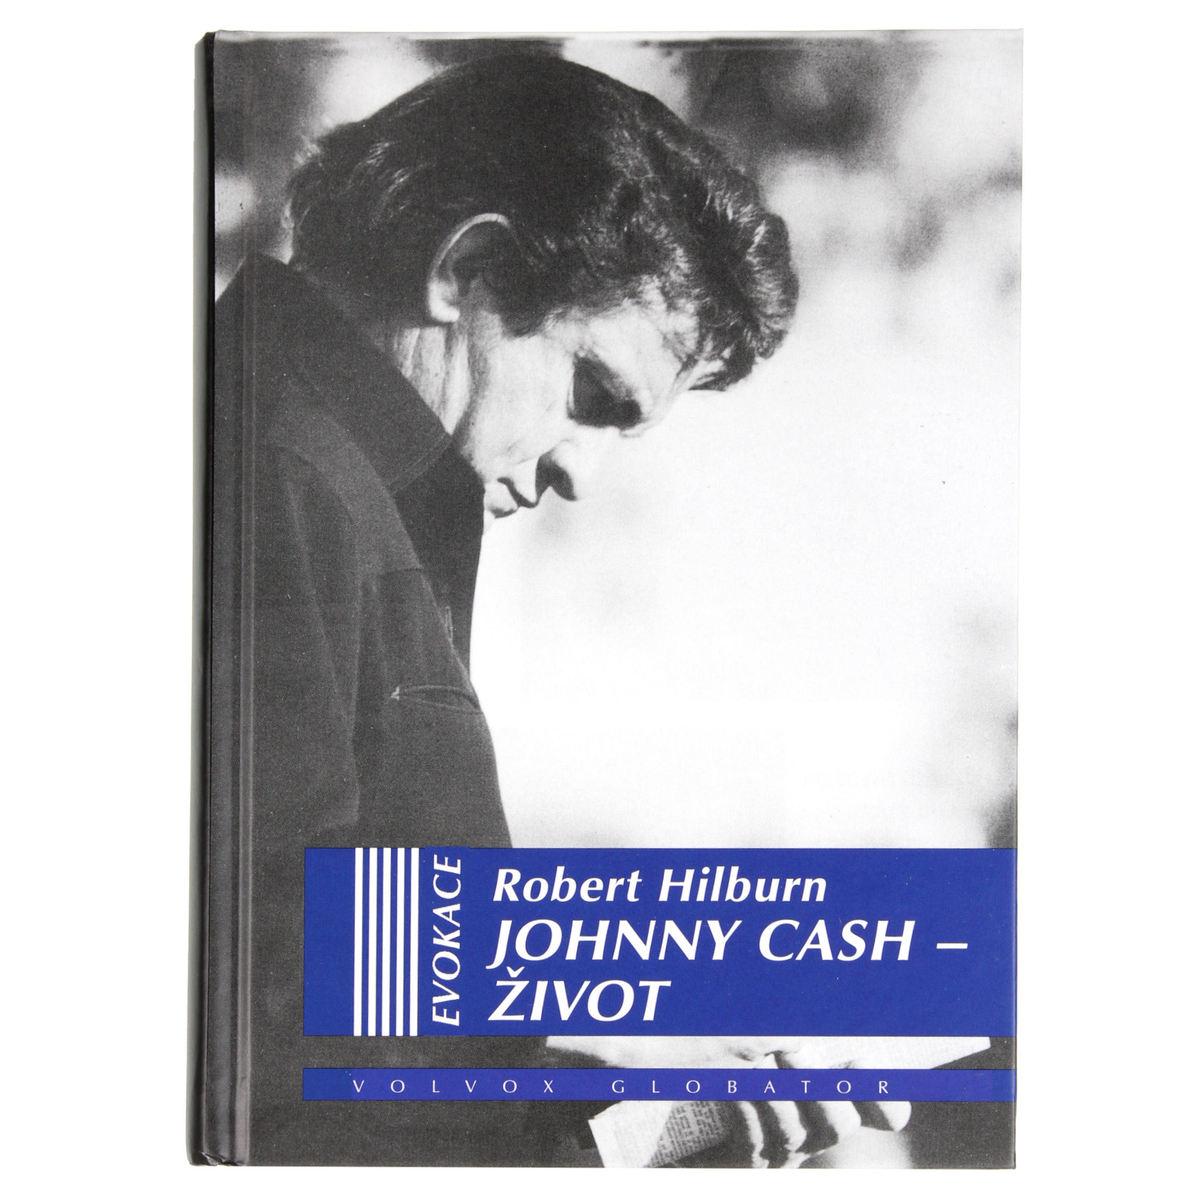 kniha Johnny Cash - Život - VOL023